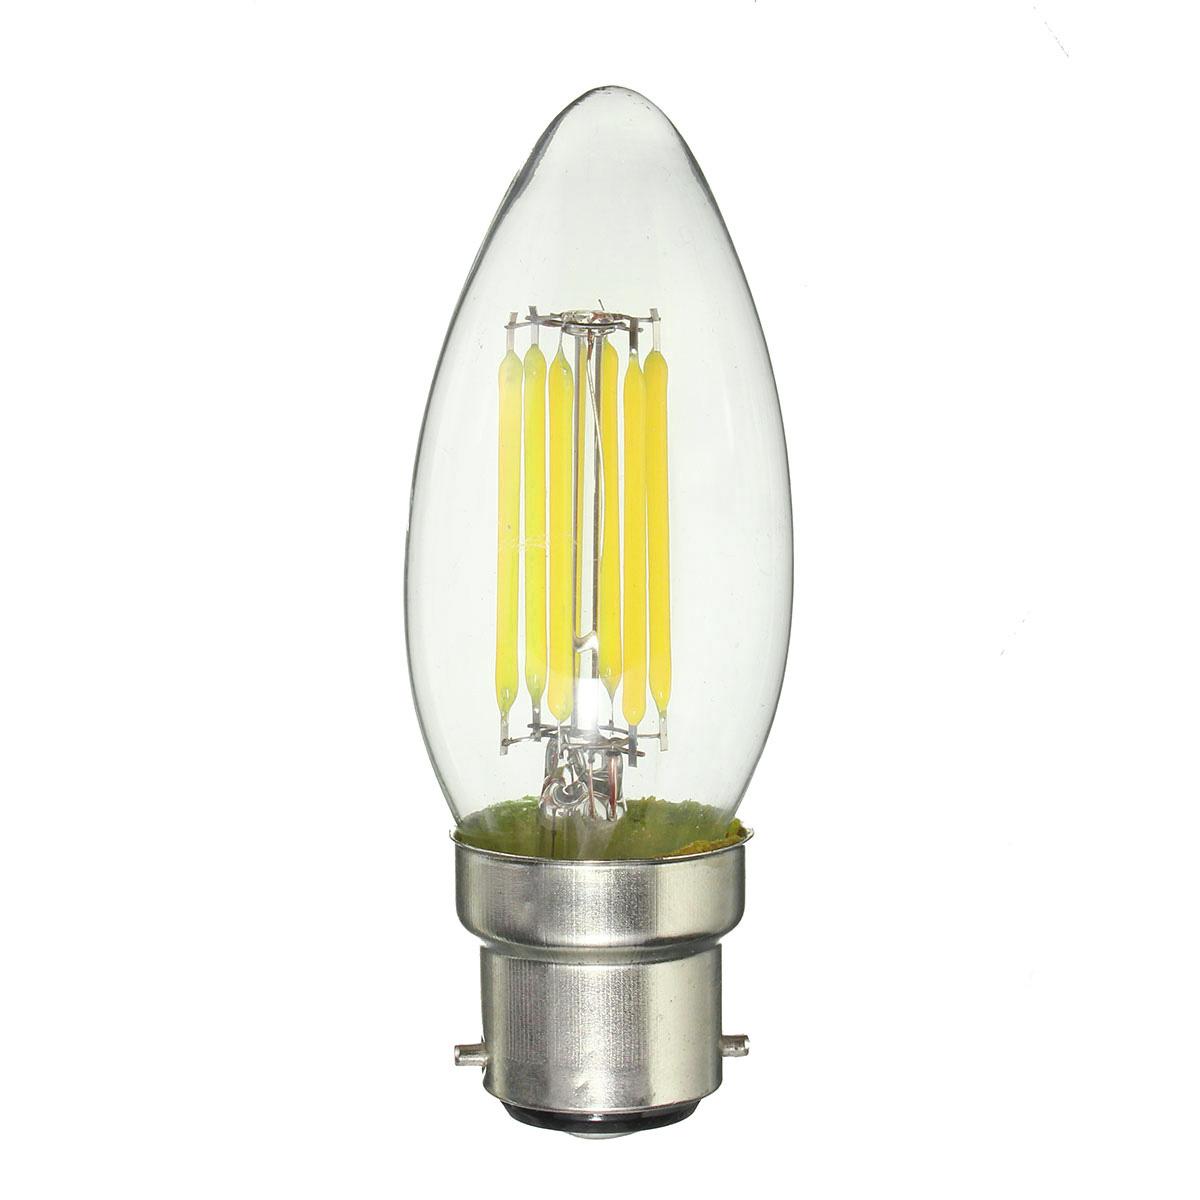 Dimmable B22 C35 6W COB Pure White Warm White Edison Retro Light Lamp Bulb AC220V